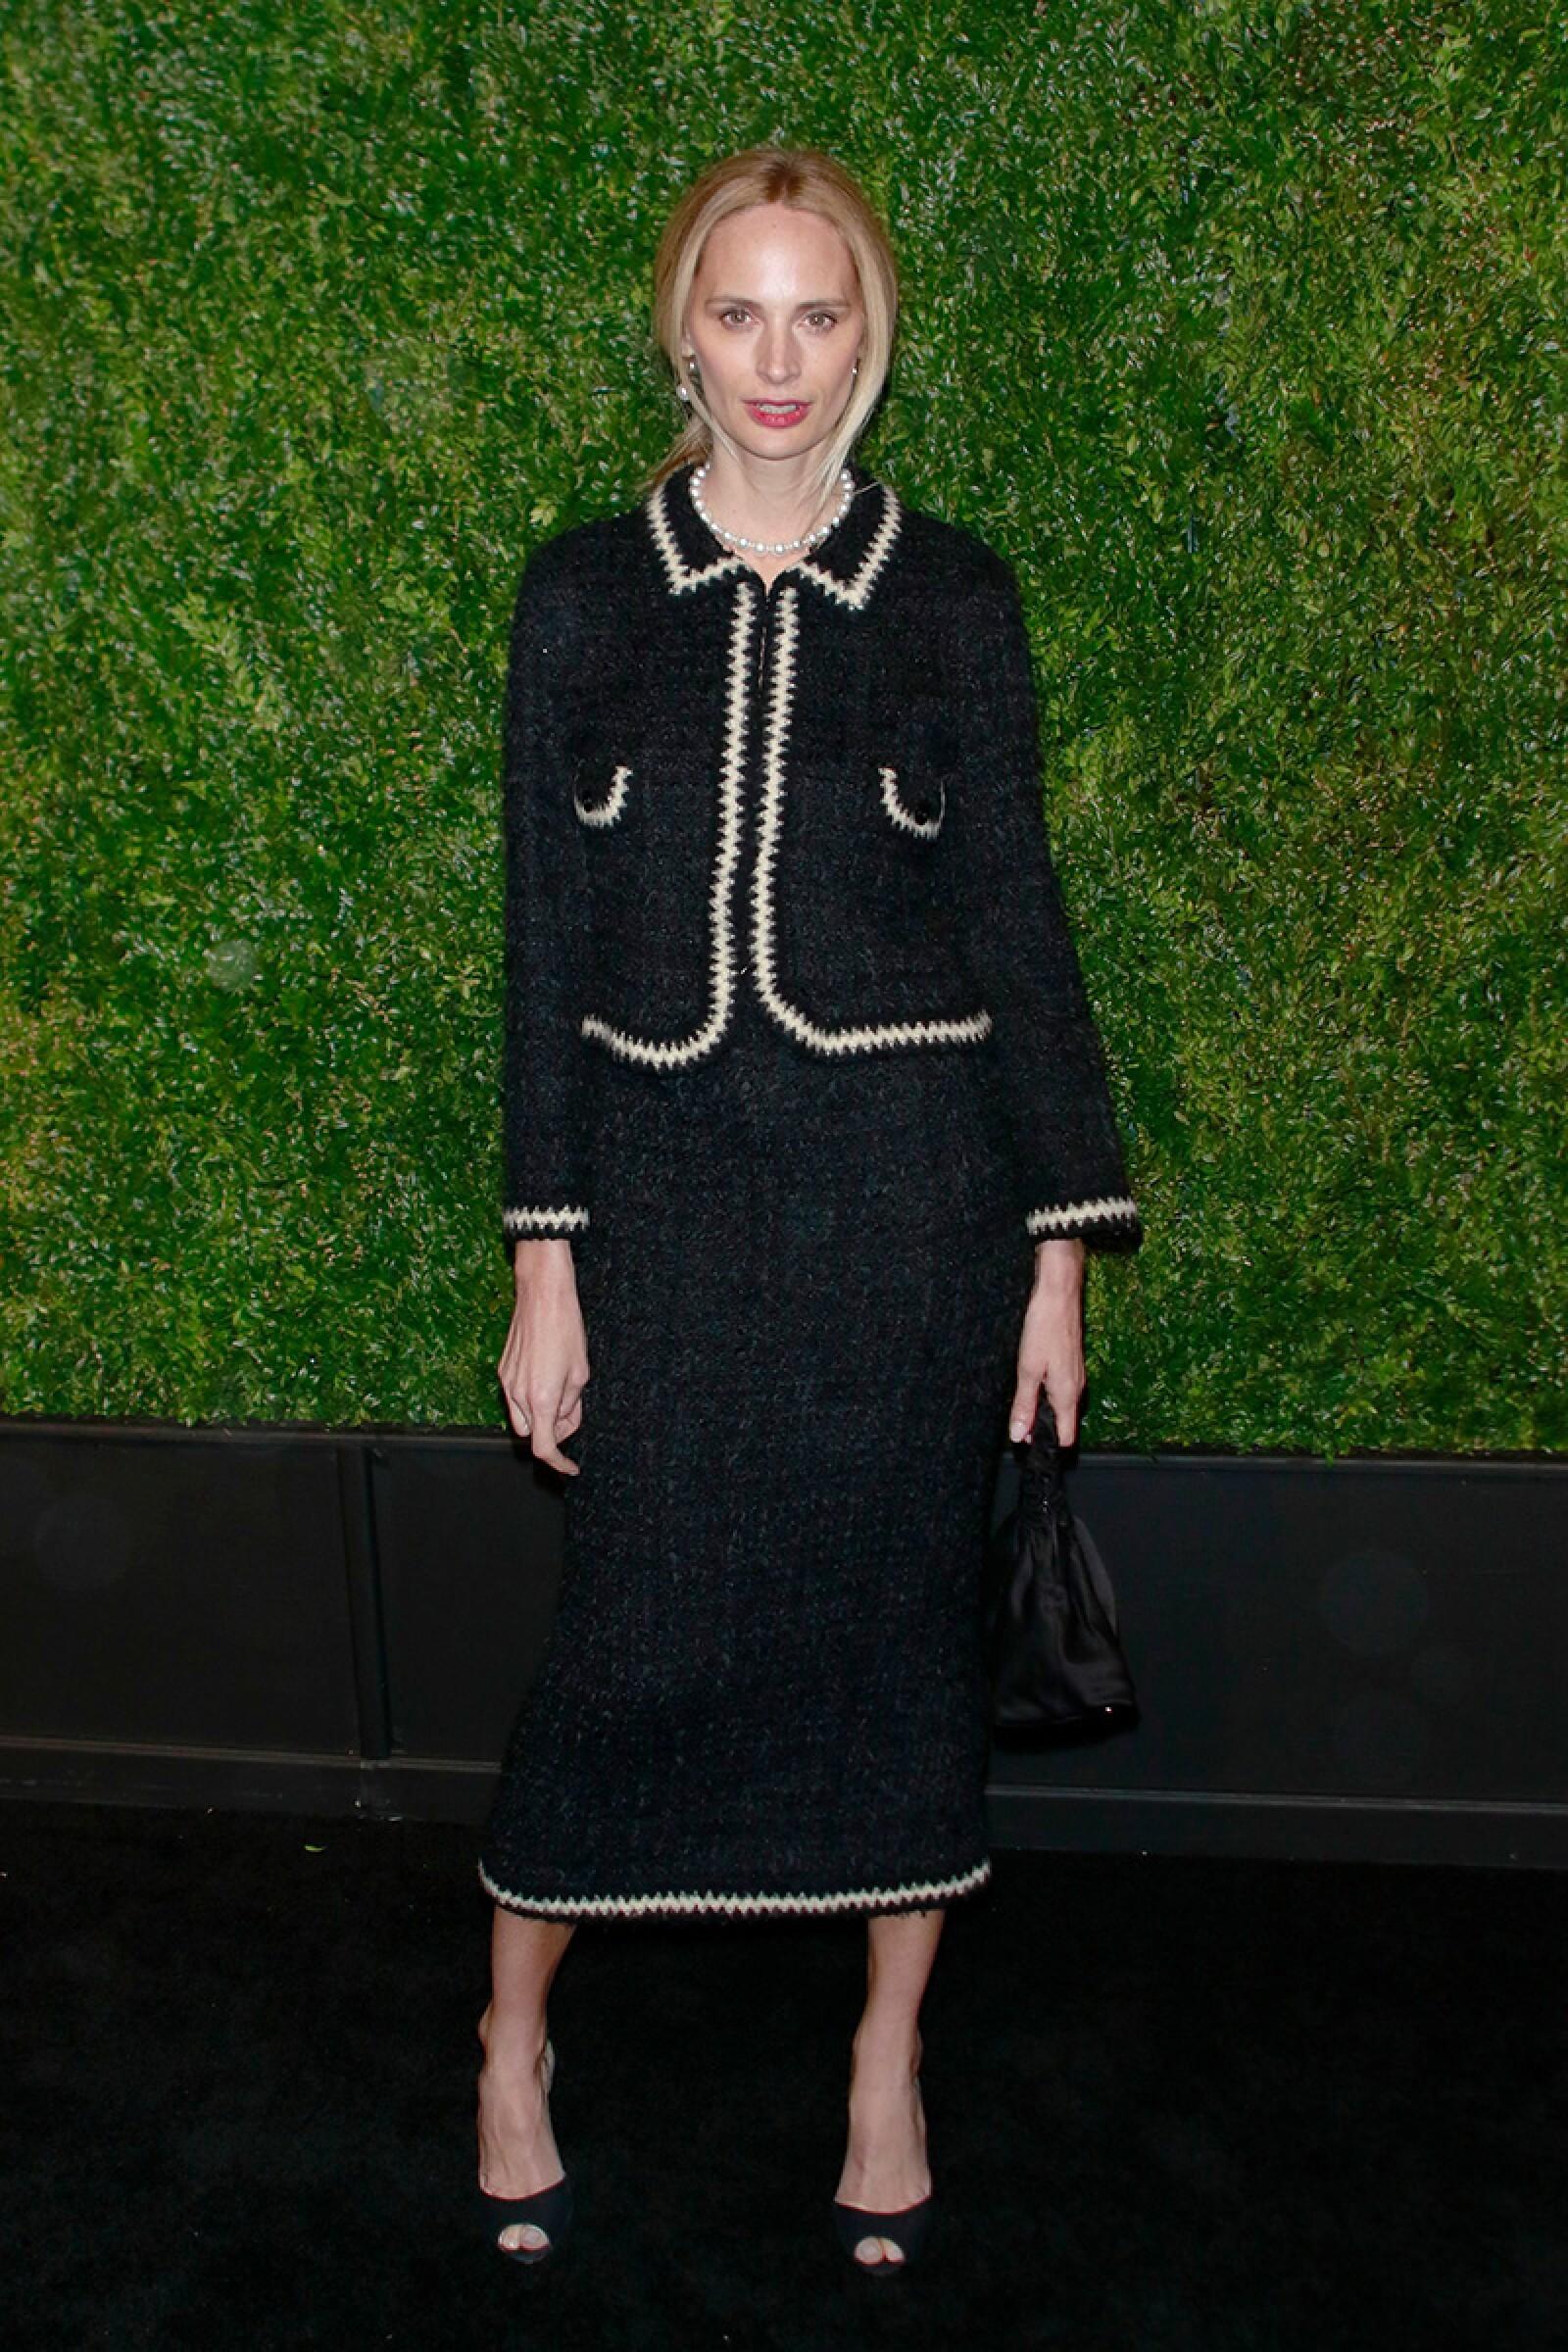 14th Annual Tribeca Film Festival Artists Dinner hosted by Chanel, Arrivals, Balthazar restaurant, New York, USA - 29 Apr 2019